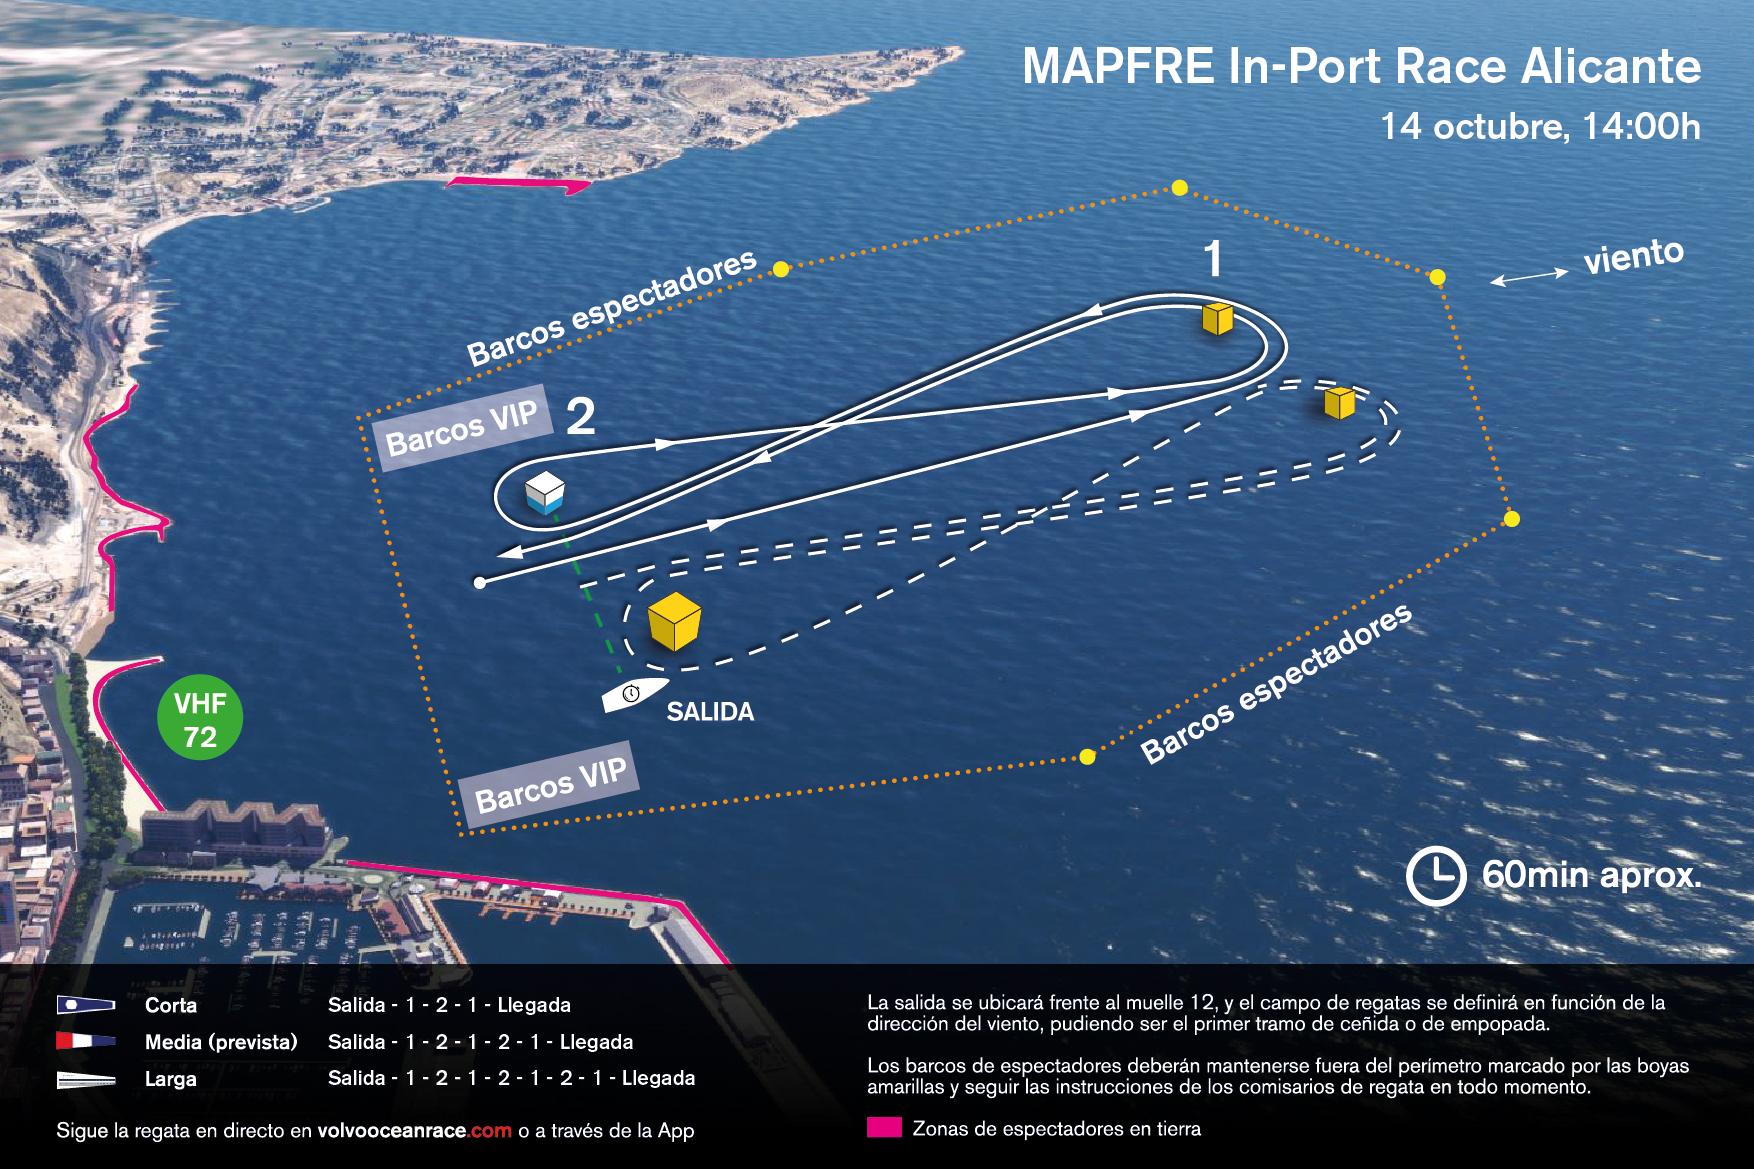 Alicante-3D-course-map-for-the-In-Port-Race-Alicante